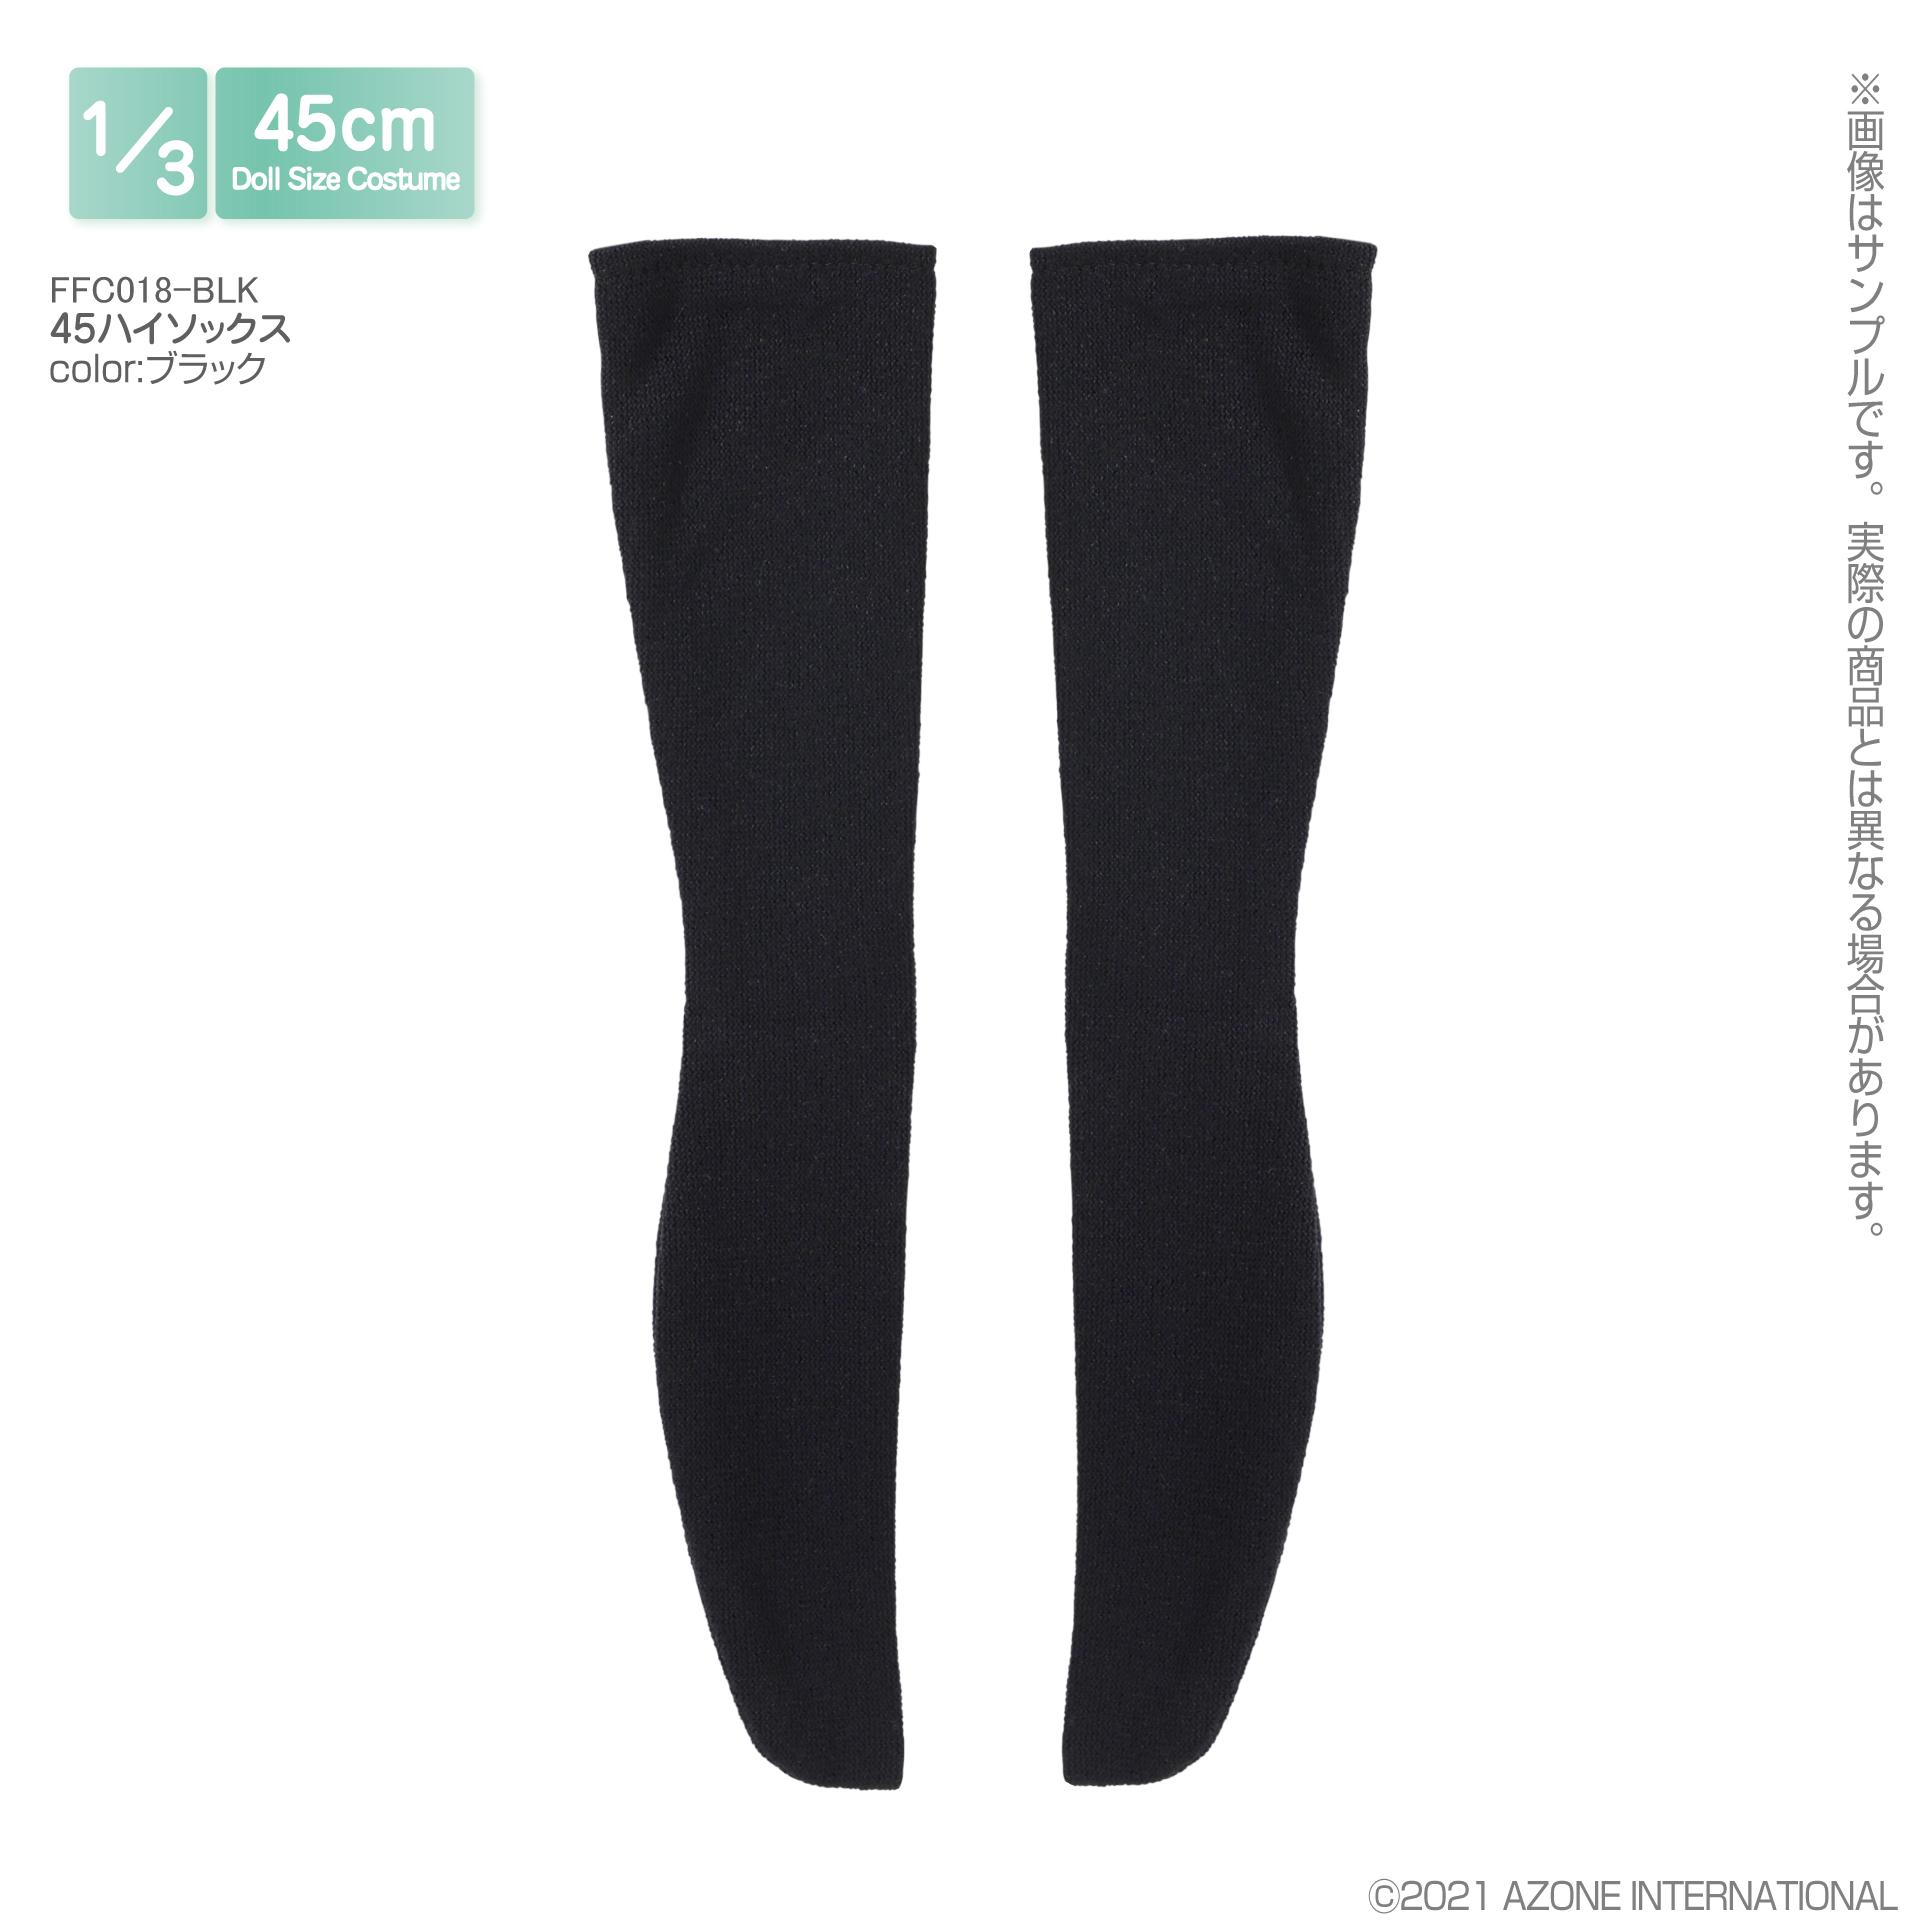 45cmコレクション『45体操着set[エンジ]』1/3 ドール服-004